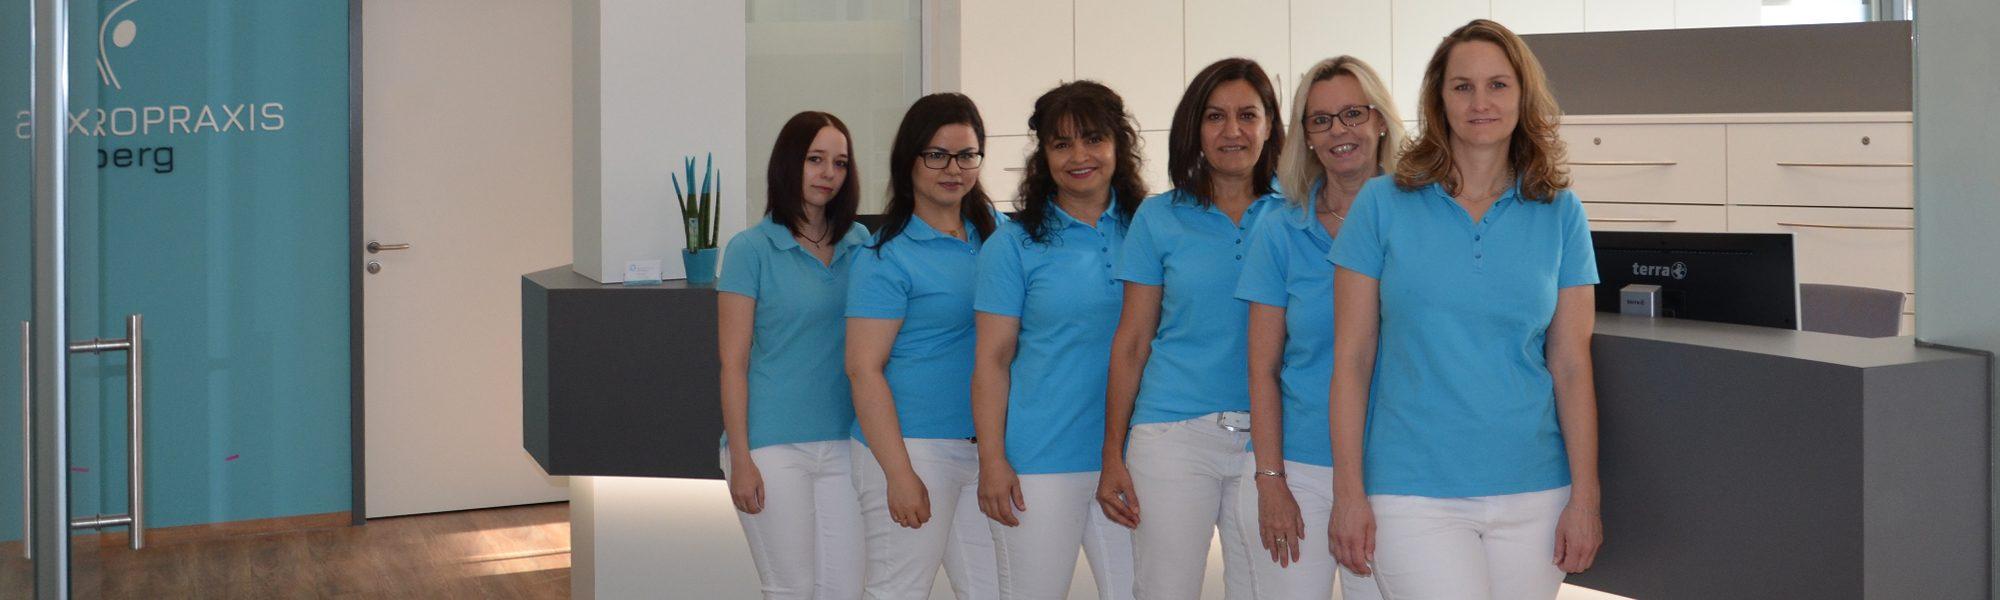 Team der Neuropraxis Nürnberg